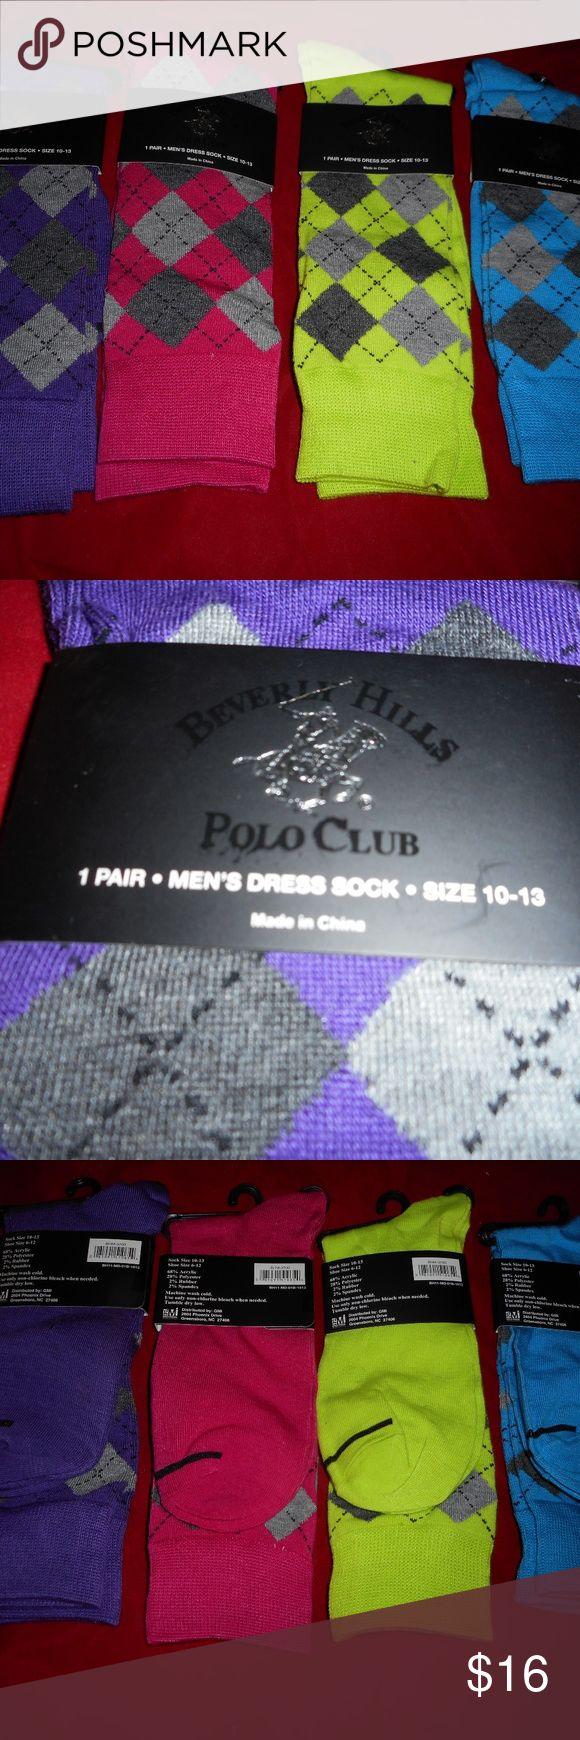 4 Pairs Beverly Hills Polo Club Mens Dress Socks Beverly Hills Polo Club 4 Pairs Mens Acrylic Dress Sock  Sock size 10-13 Fits Shoe Size 6-12 64% Acrylic 33% Polyester 2% Rubber 1% Spandex Beverly Hills Polo Club Underwear & Socks Dress Socks